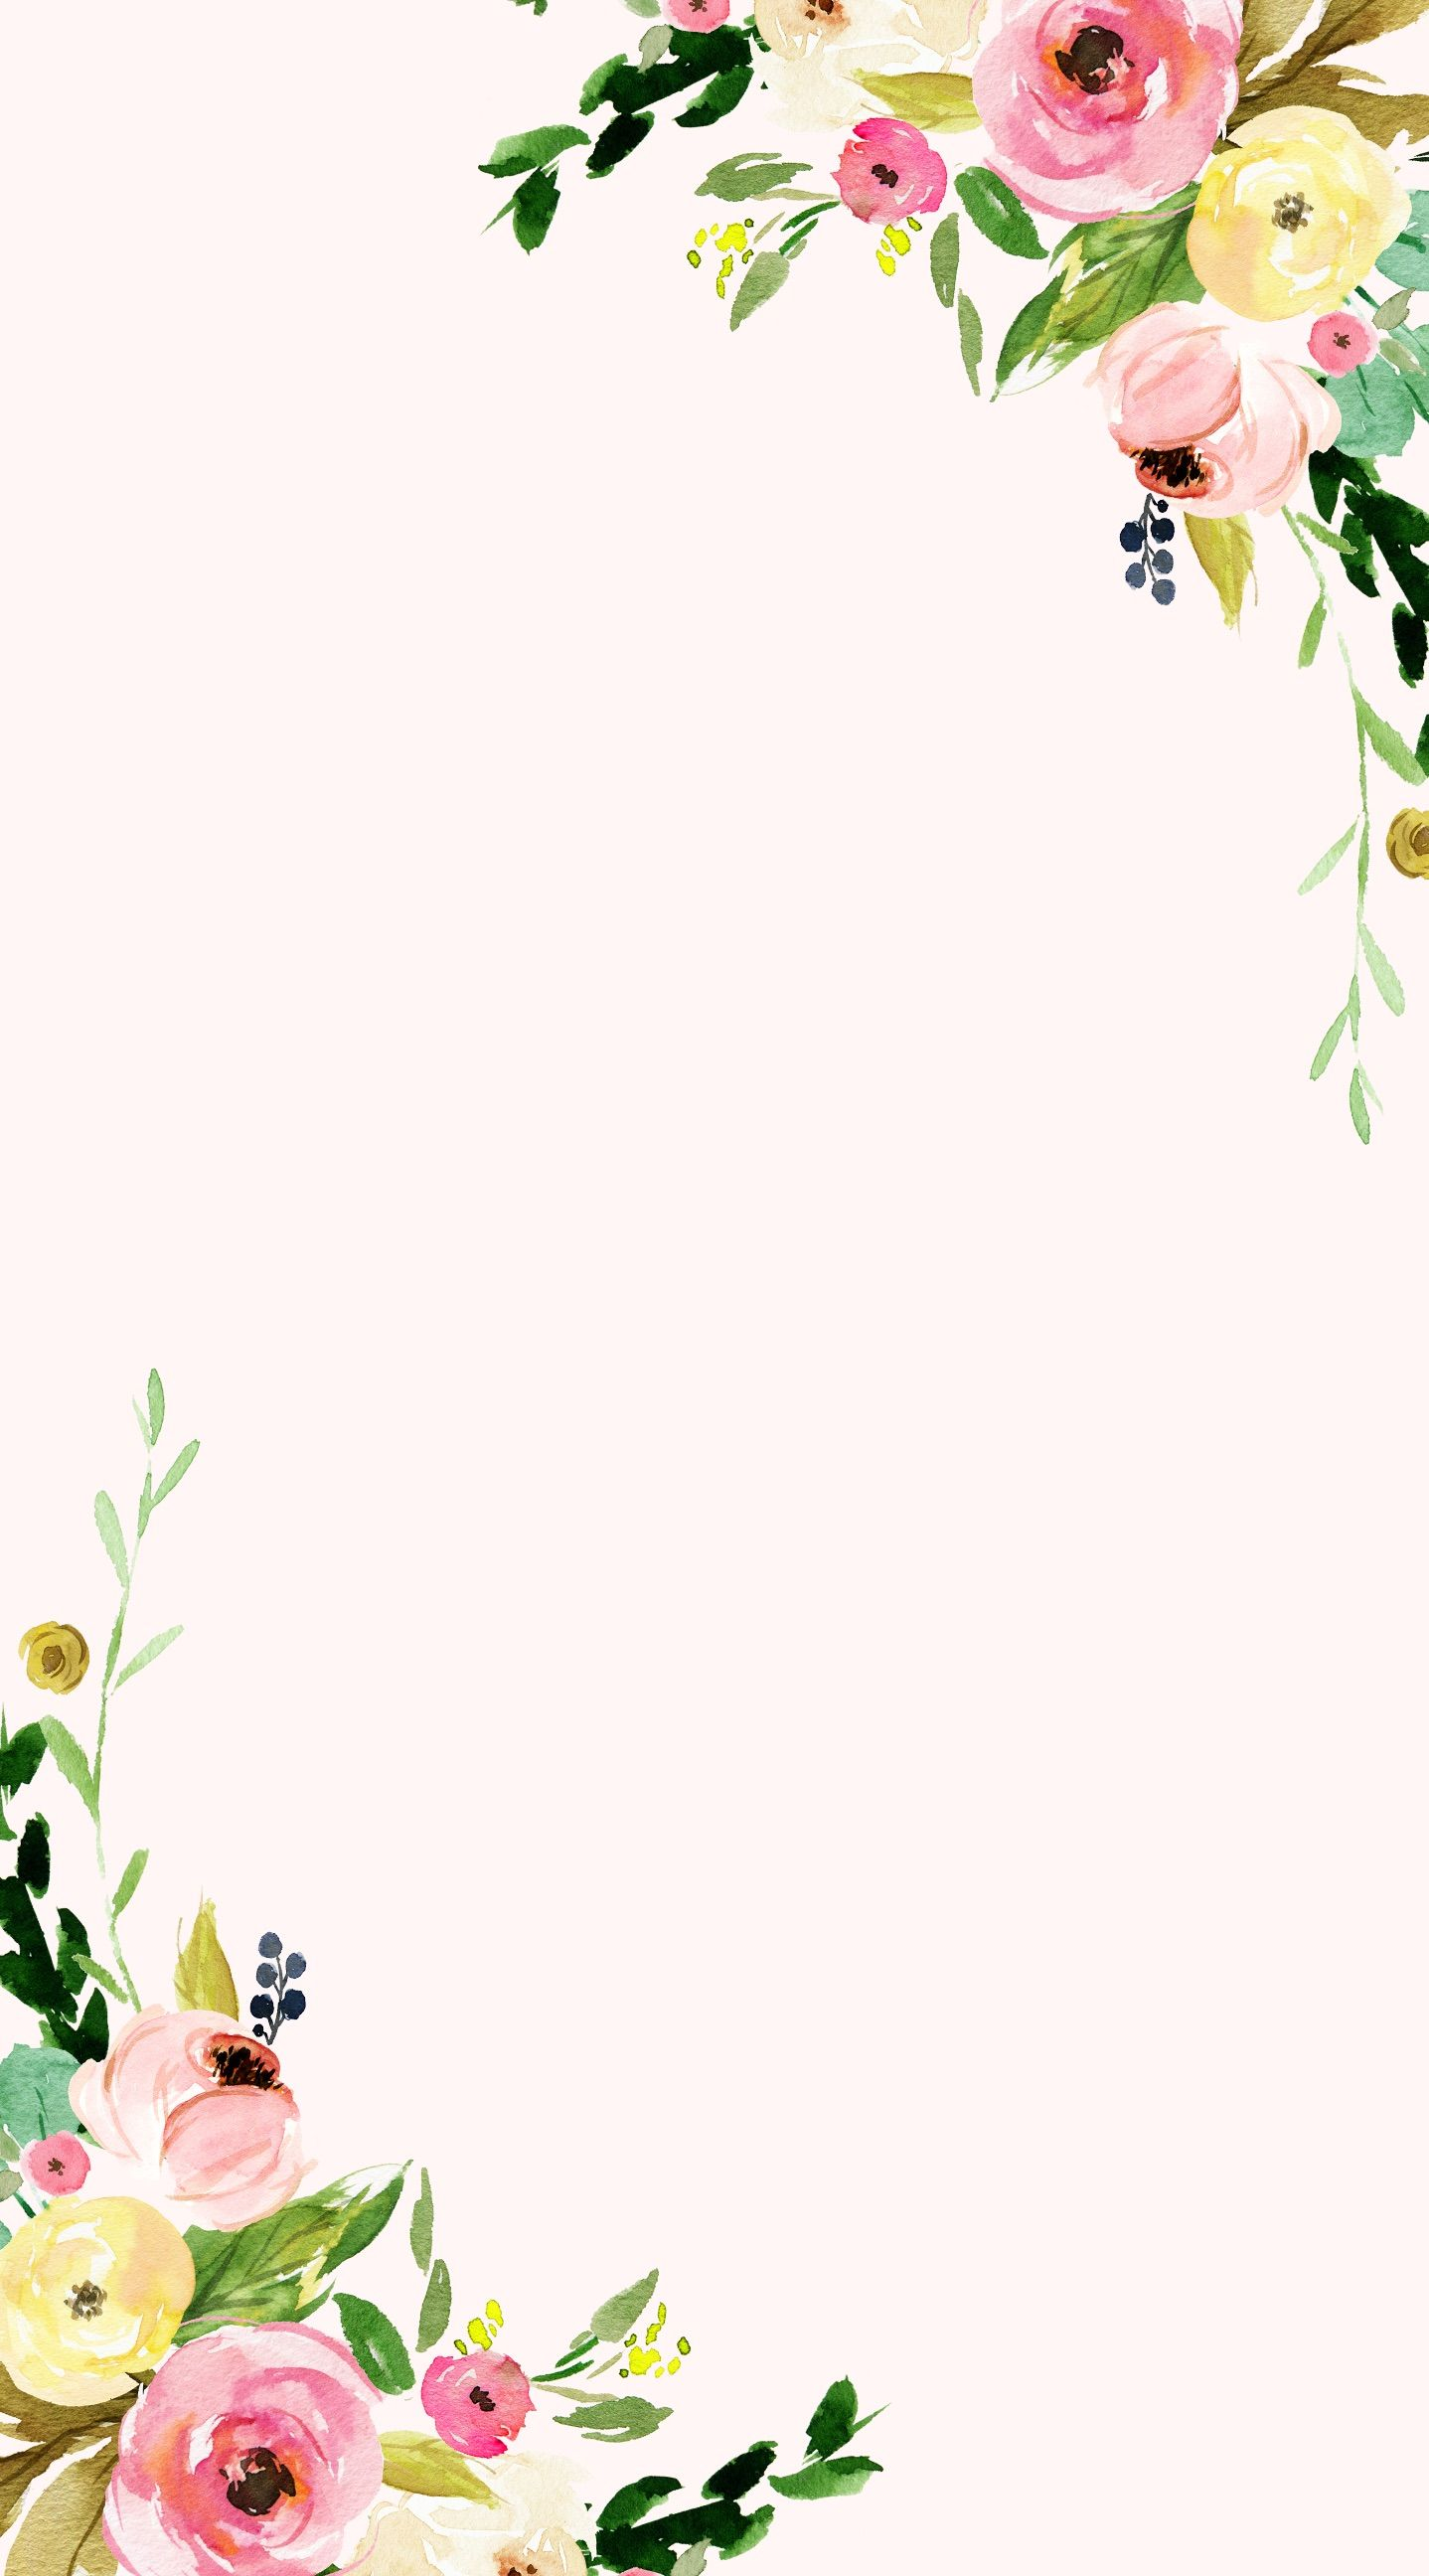 Pin de tolle Lolle en Prints / Leinwand | Pinterest | Fondos, Fondos ...